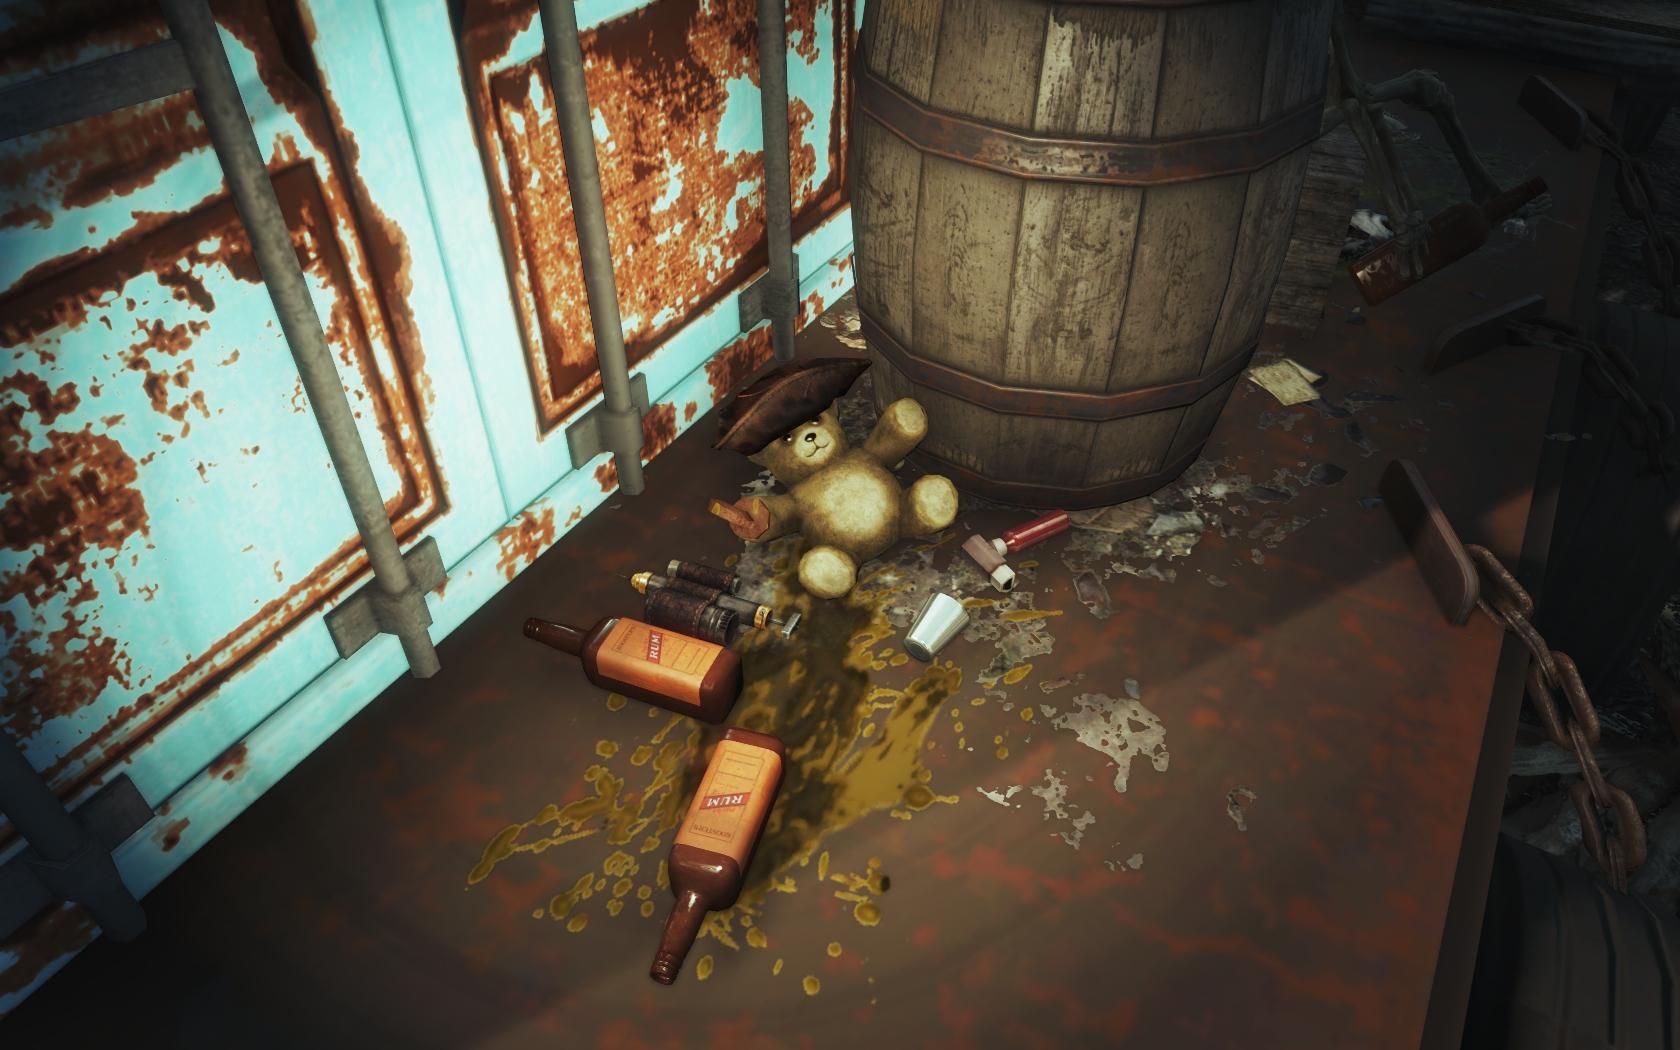 Мишка решил оторваться (Фар-Харбор, Азалия) v2 - Fallout 4 Азалия, юмор